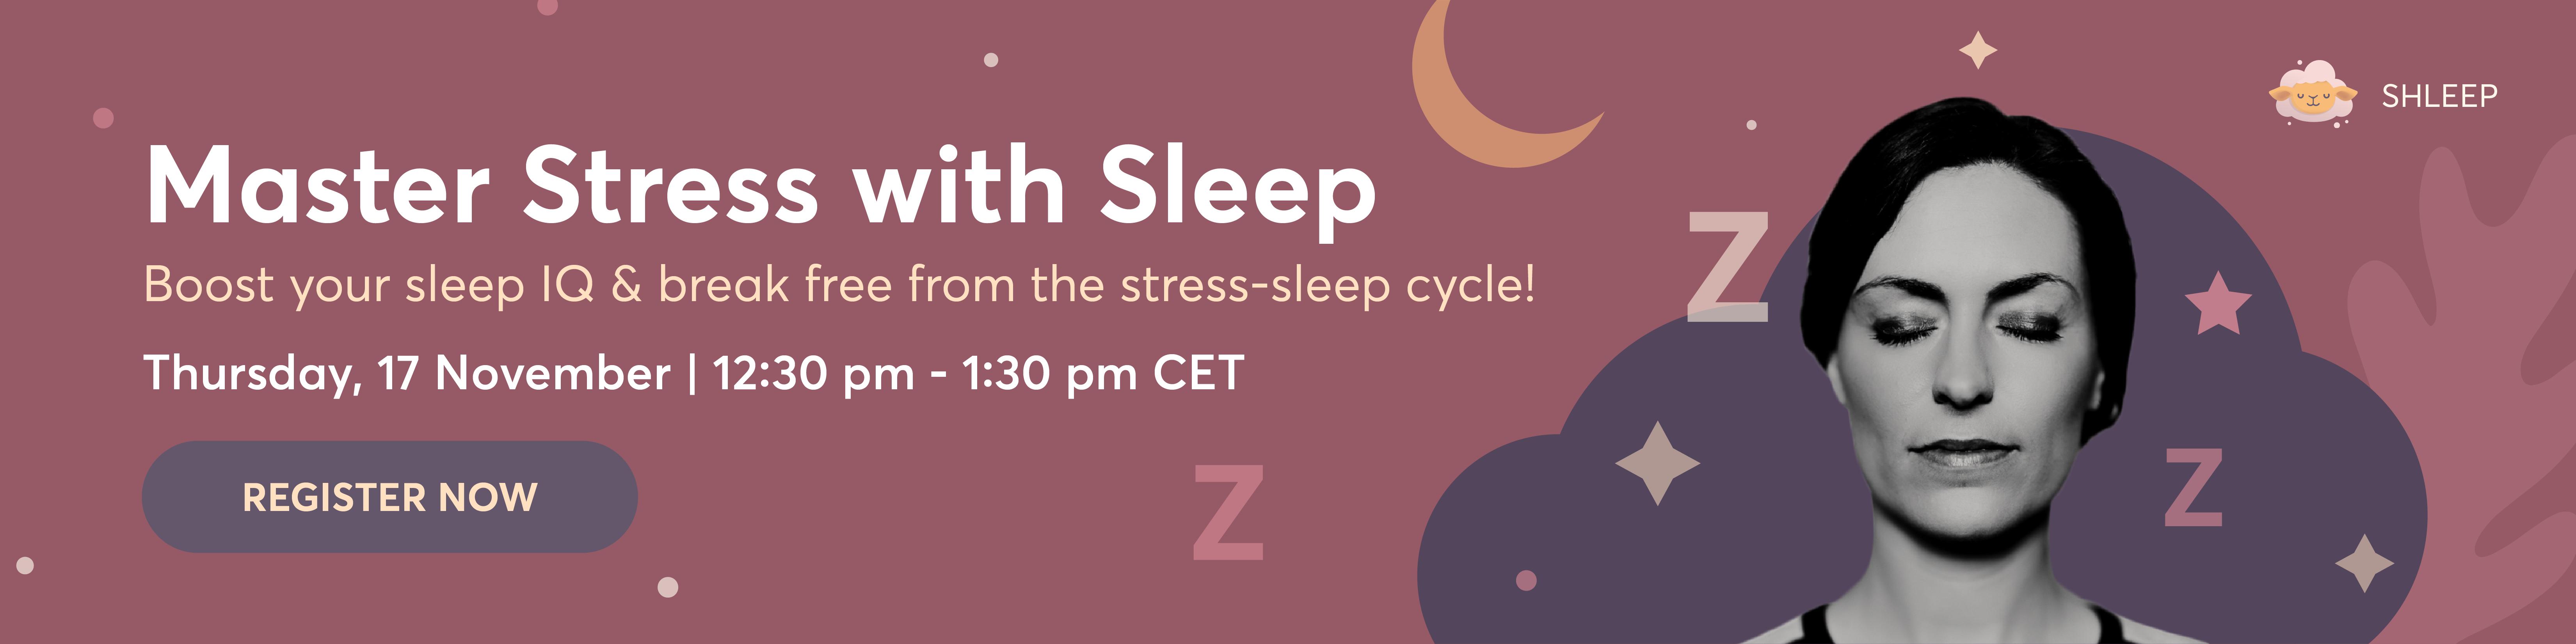 Master Stress with Sleep Webinar Registration